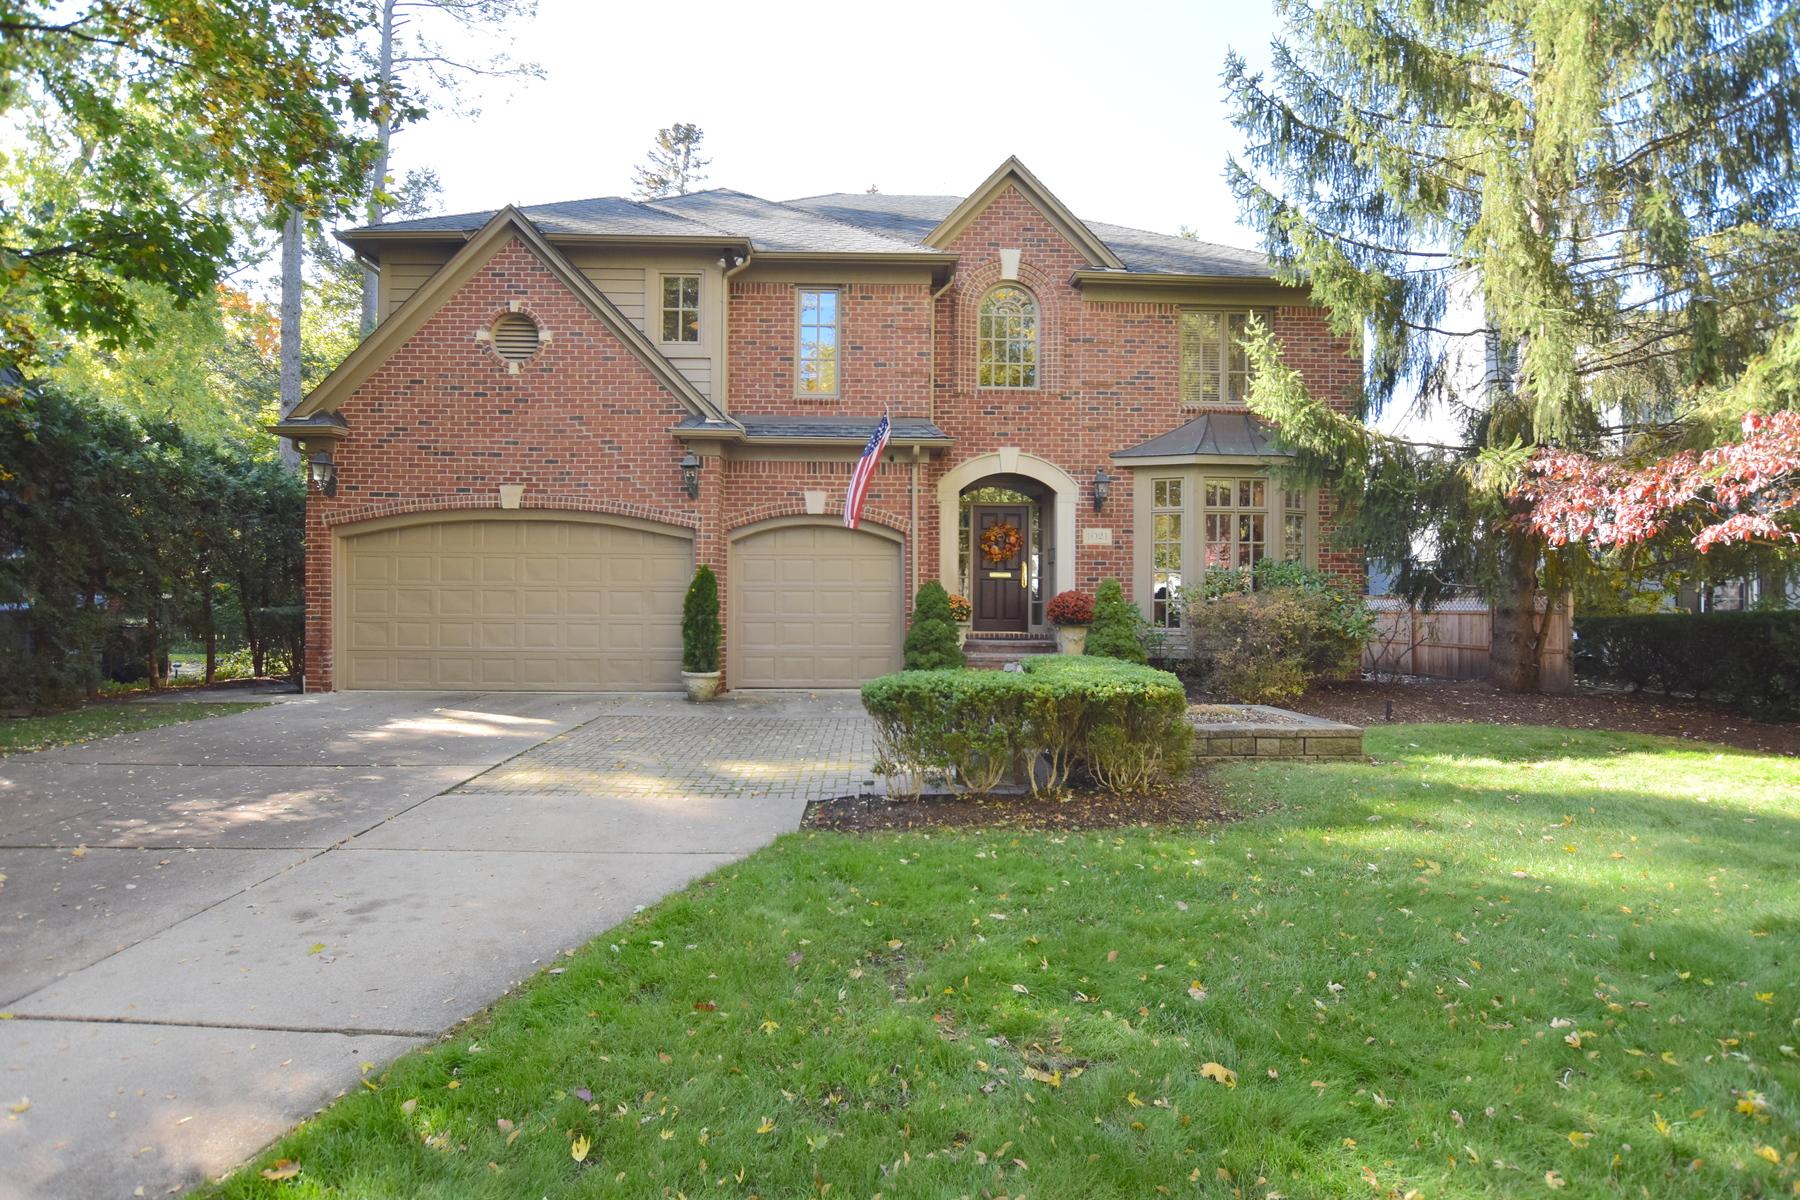 Single Family Homes for Sale at Birmingham 1021 Pilgrim Avenue Birmingham, Michigan 48009 United States